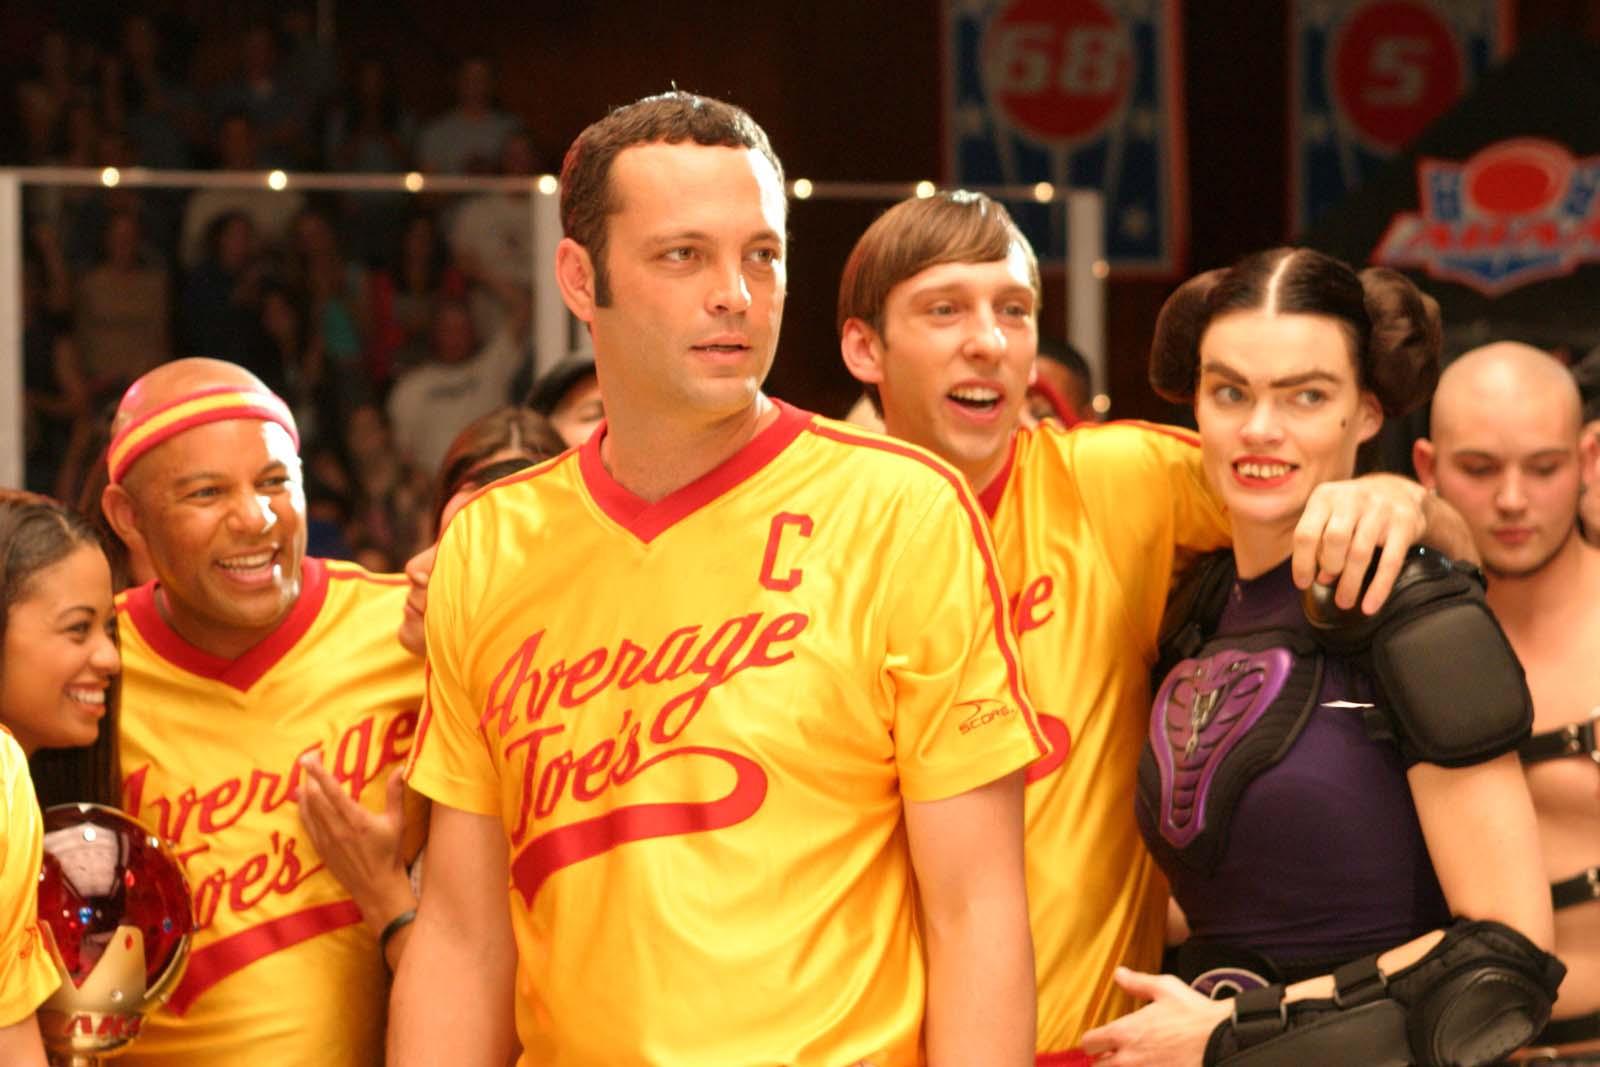 - Dodgeball: The Movie